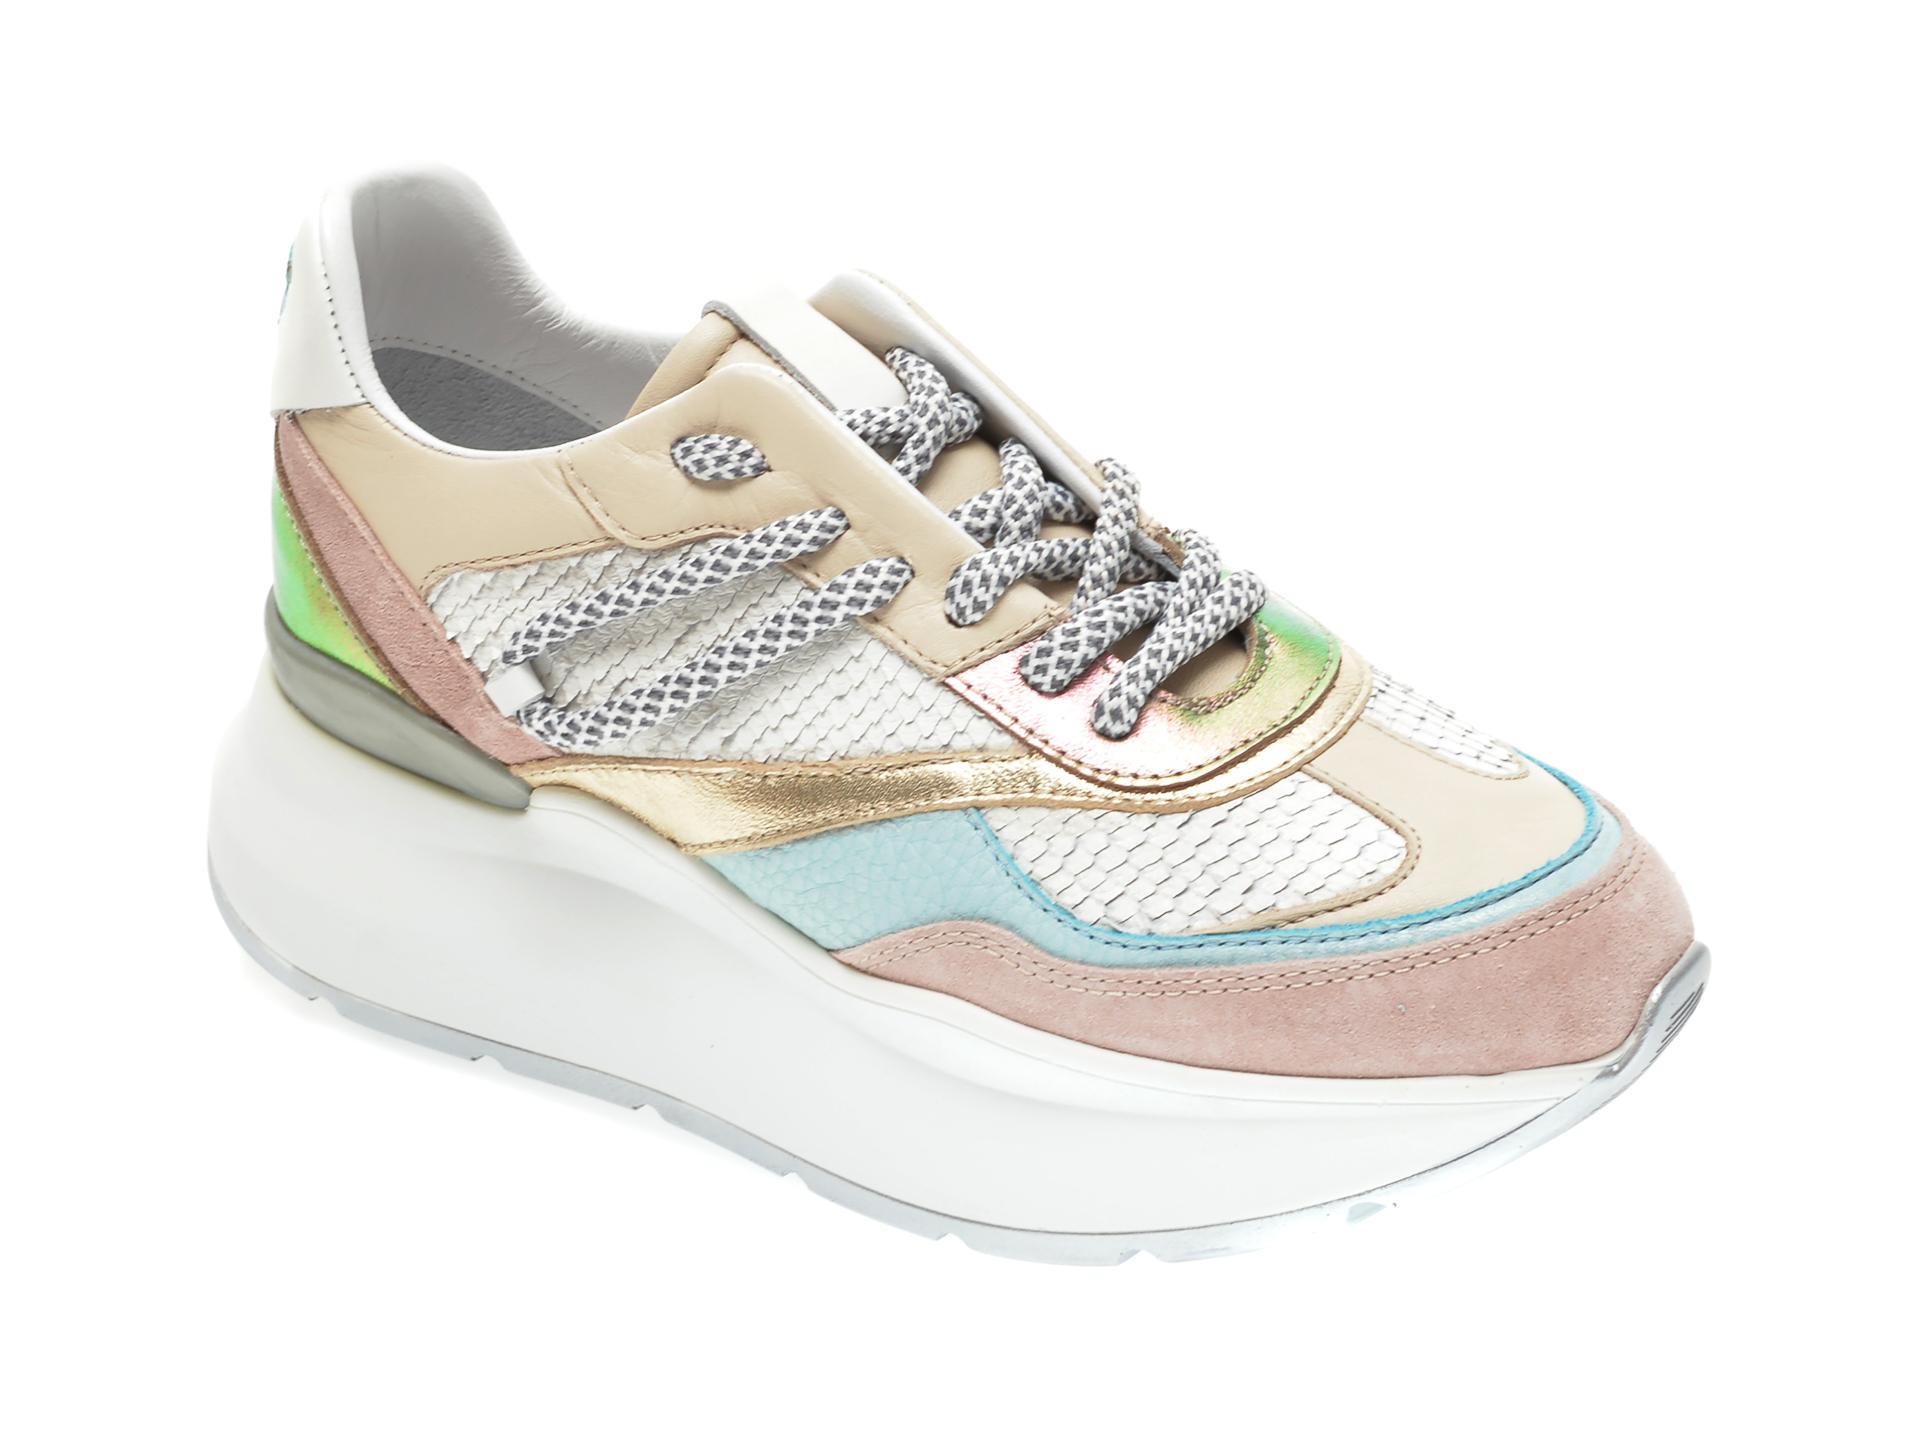 Pantofi sport RADIKAL bej, 2794, din piele ecologica si material textil